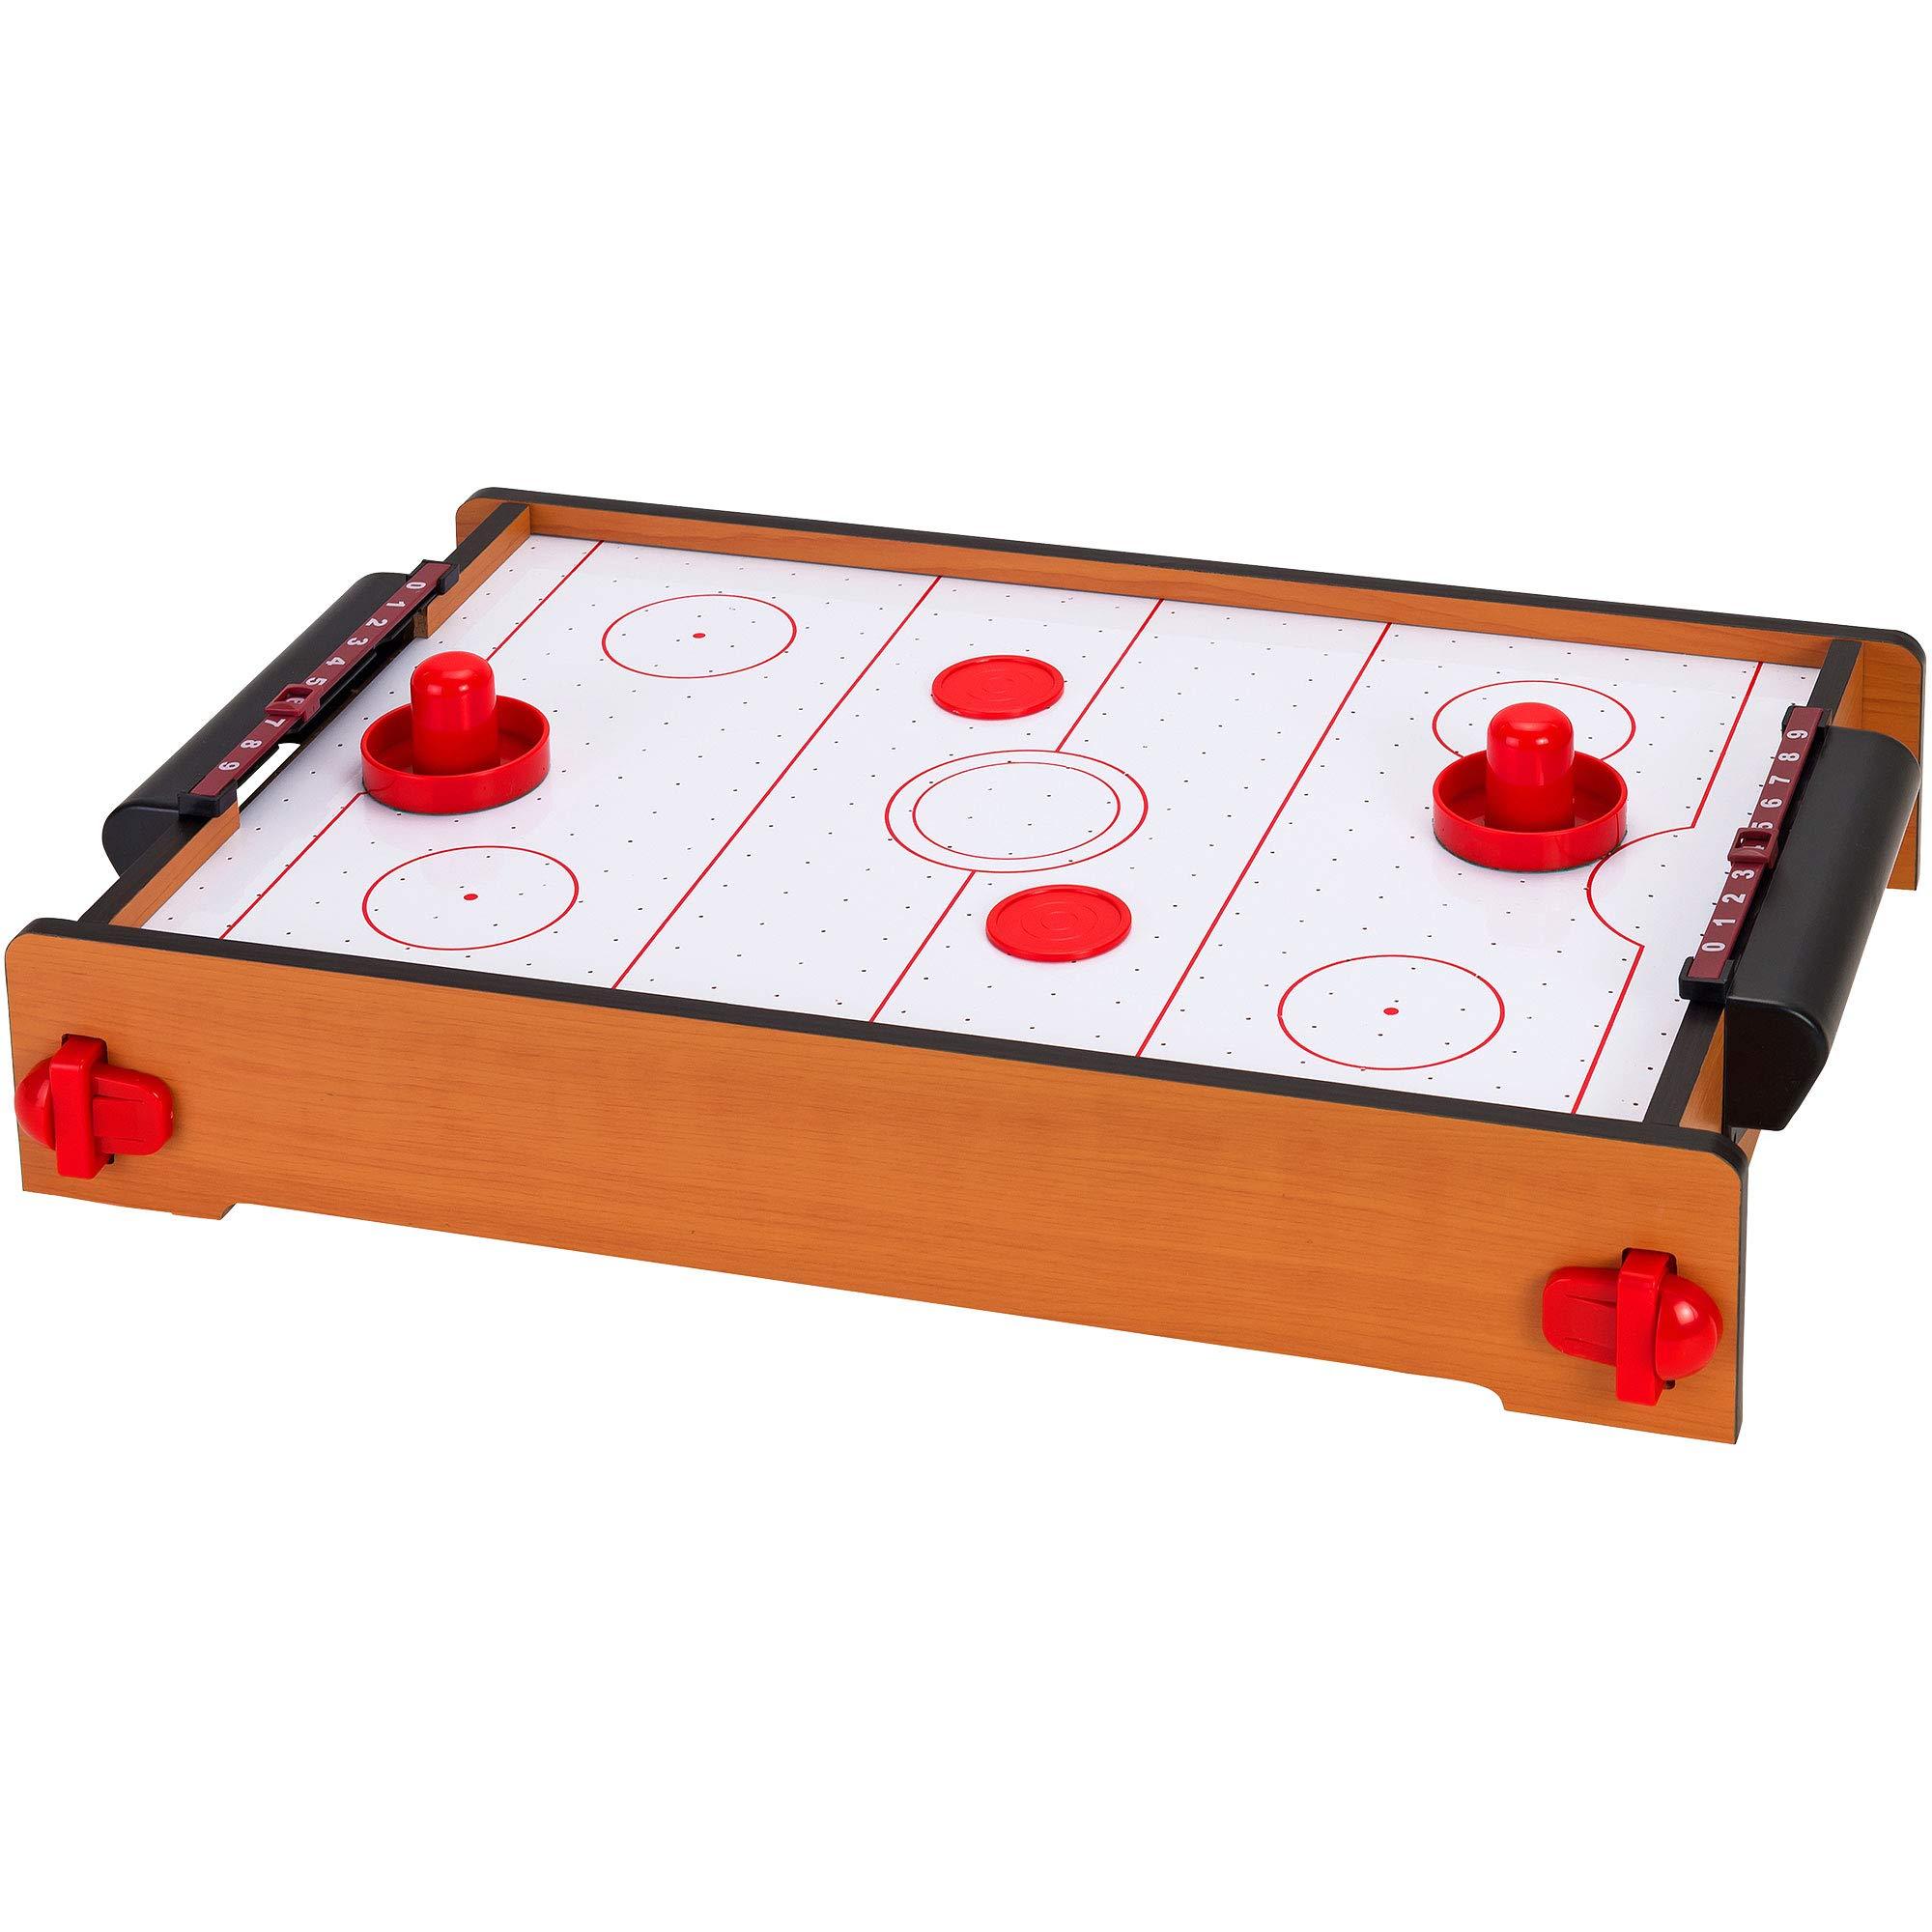 Globo Toys Globo - 37204 51 x 31 x 10.5 cm Legnoland Wooden Air Hockey Game with Printing by Globo Toys